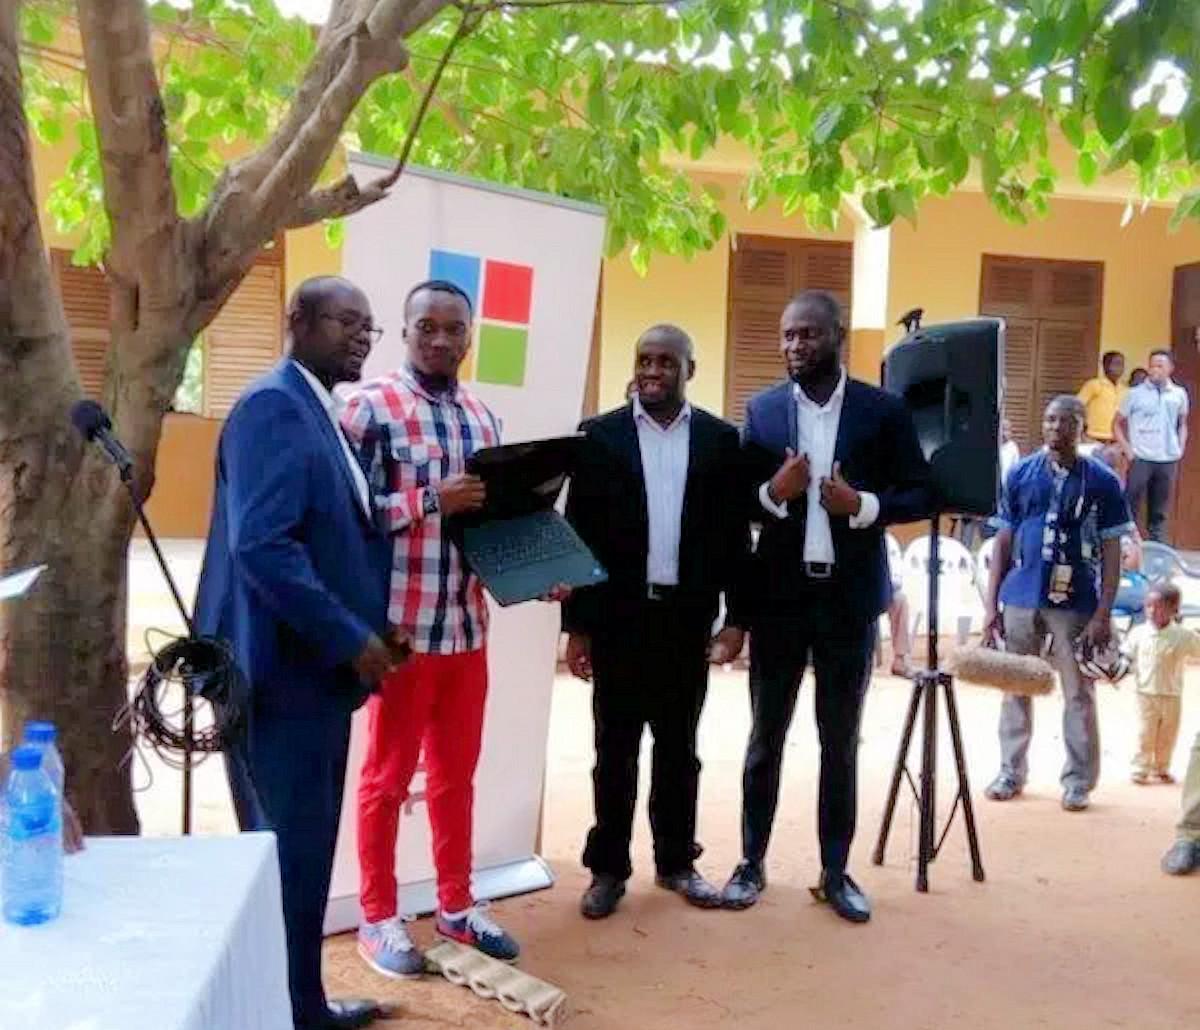 Follow-up: Microsoft donates technology to Ghanaian school with dedicated CS teacher 1